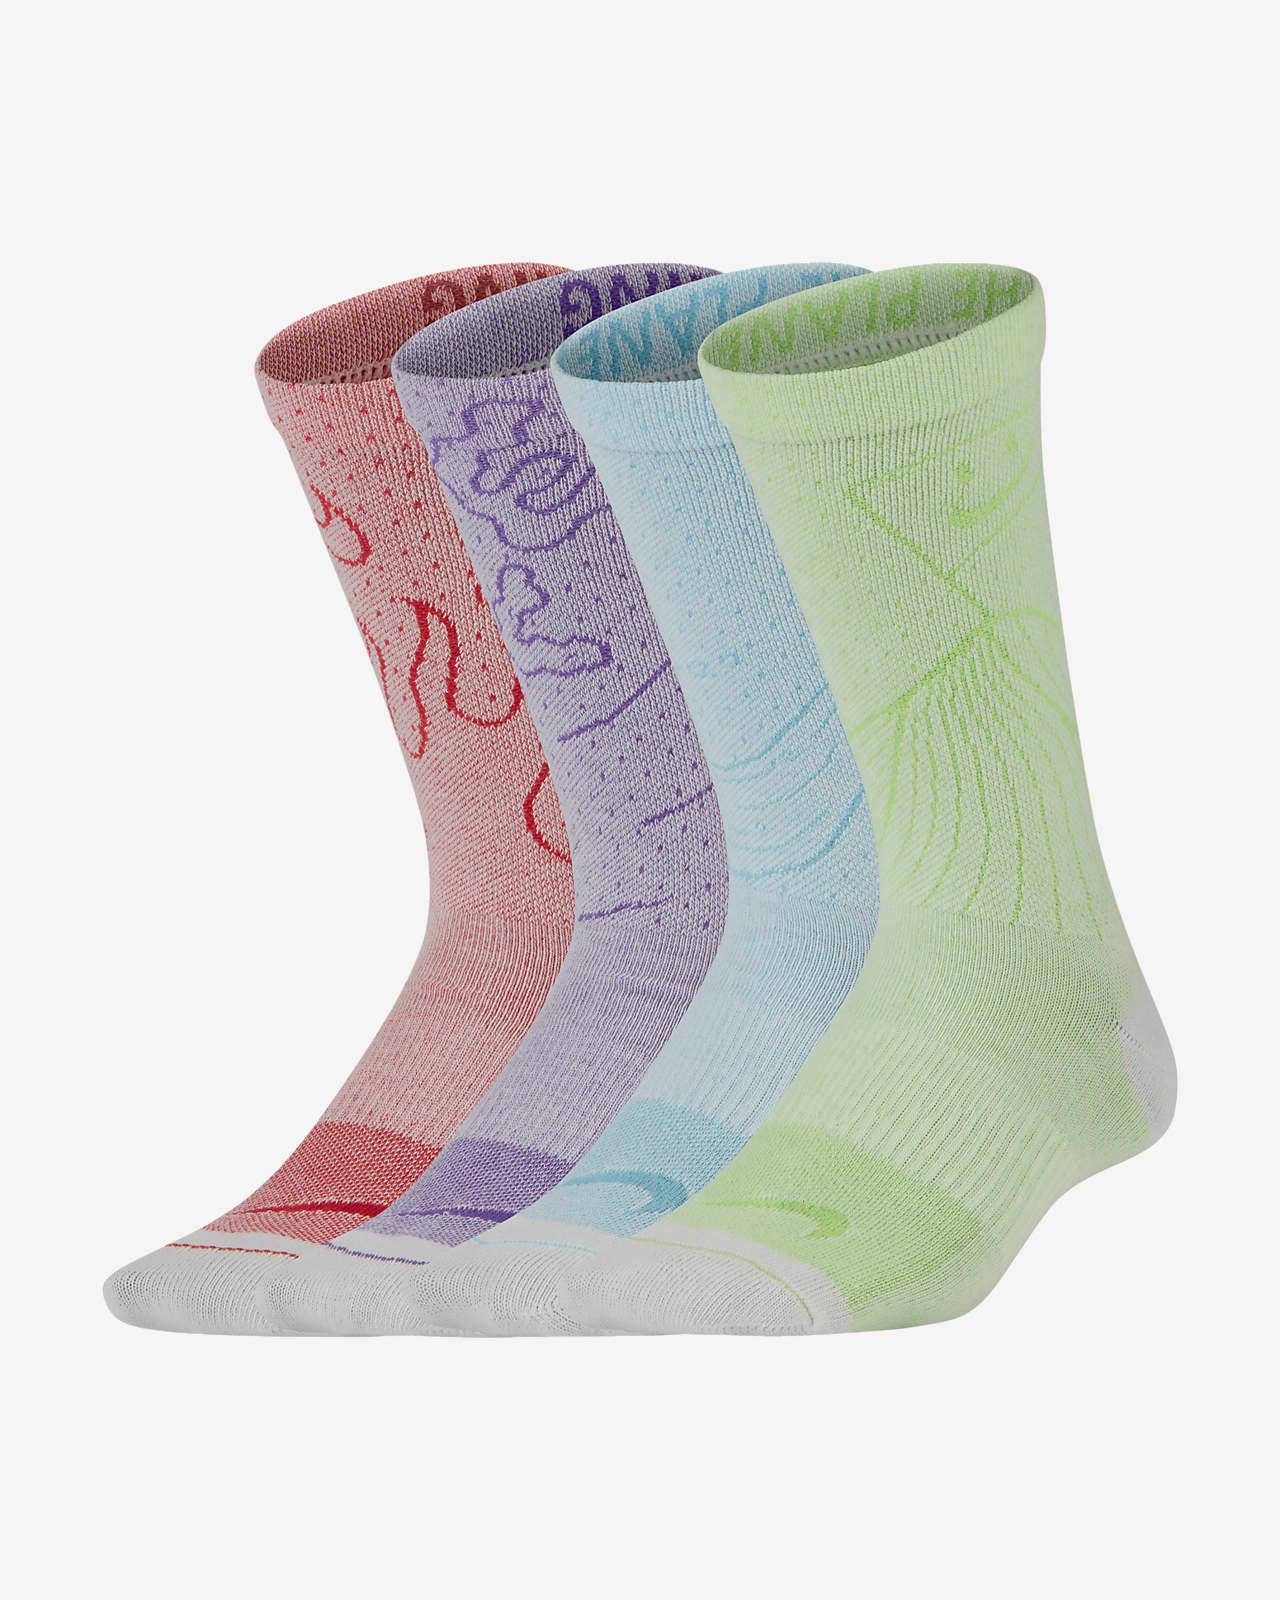 Nike Swoosh Lightweight Big Kids' Crew Socks (2 Pairs)